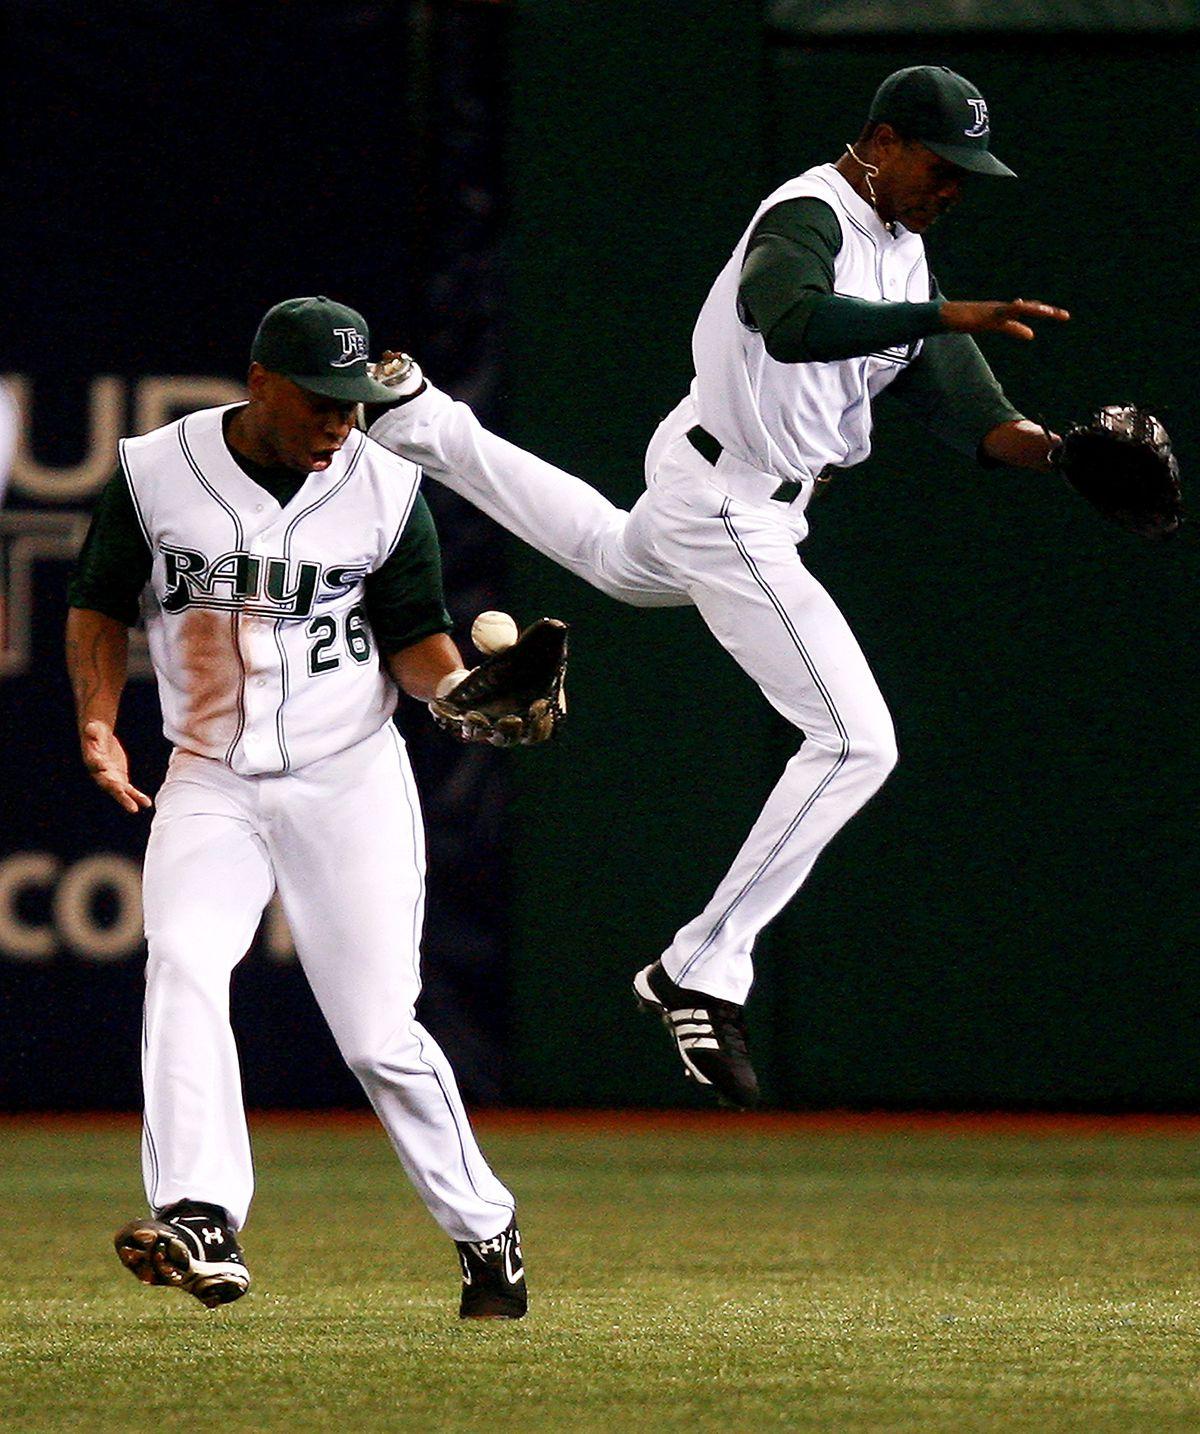 Former Rays Shortstop Brendan Harris On How Baseball Has